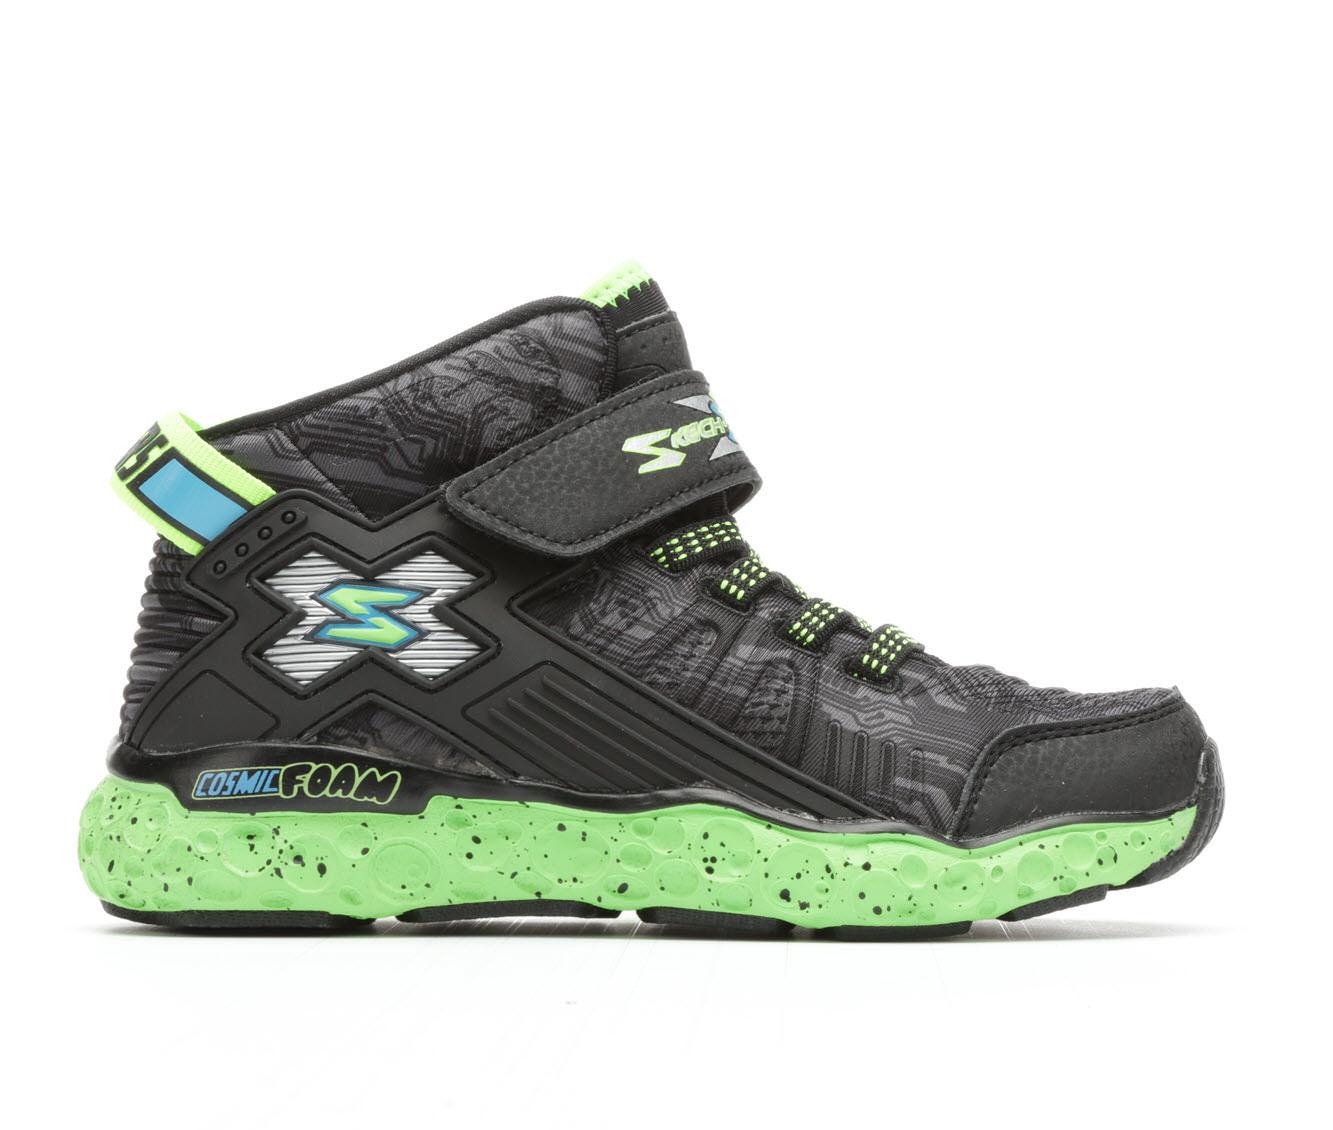 Boys' Skechers Cosmic Foam Hi Sneakers (Black)